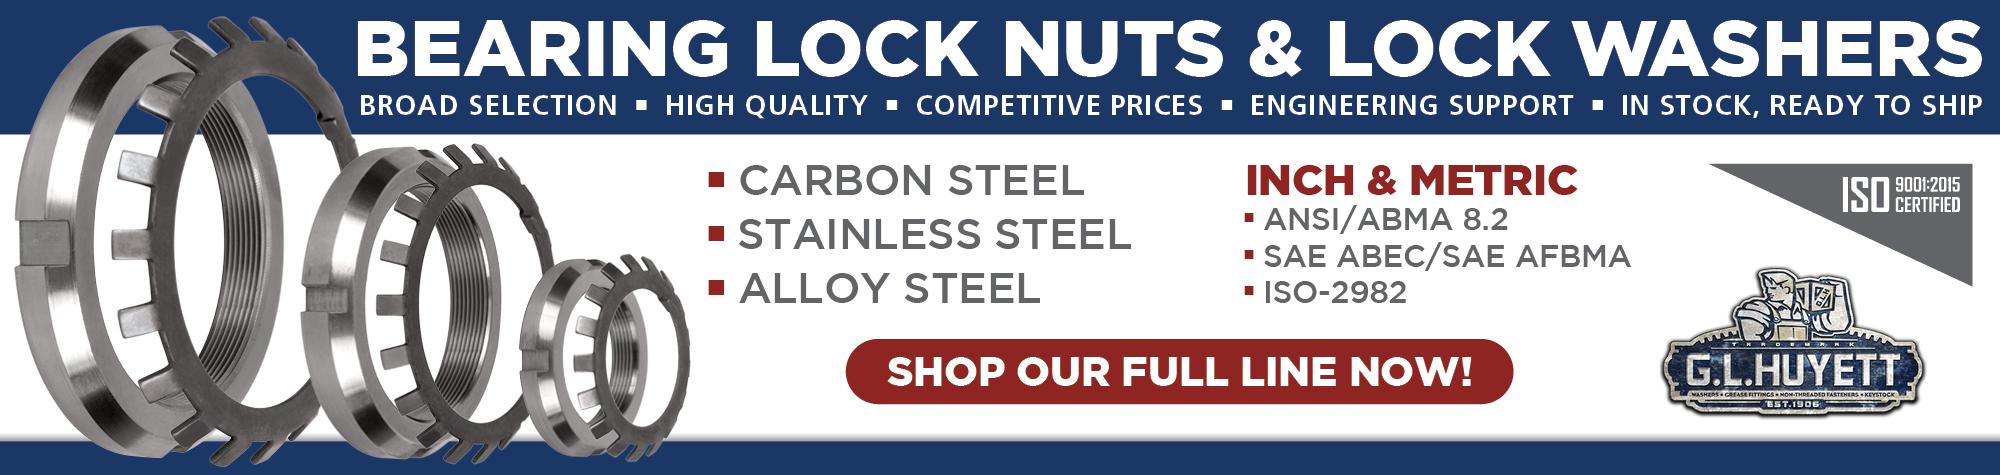 Bearing Lock Nuts